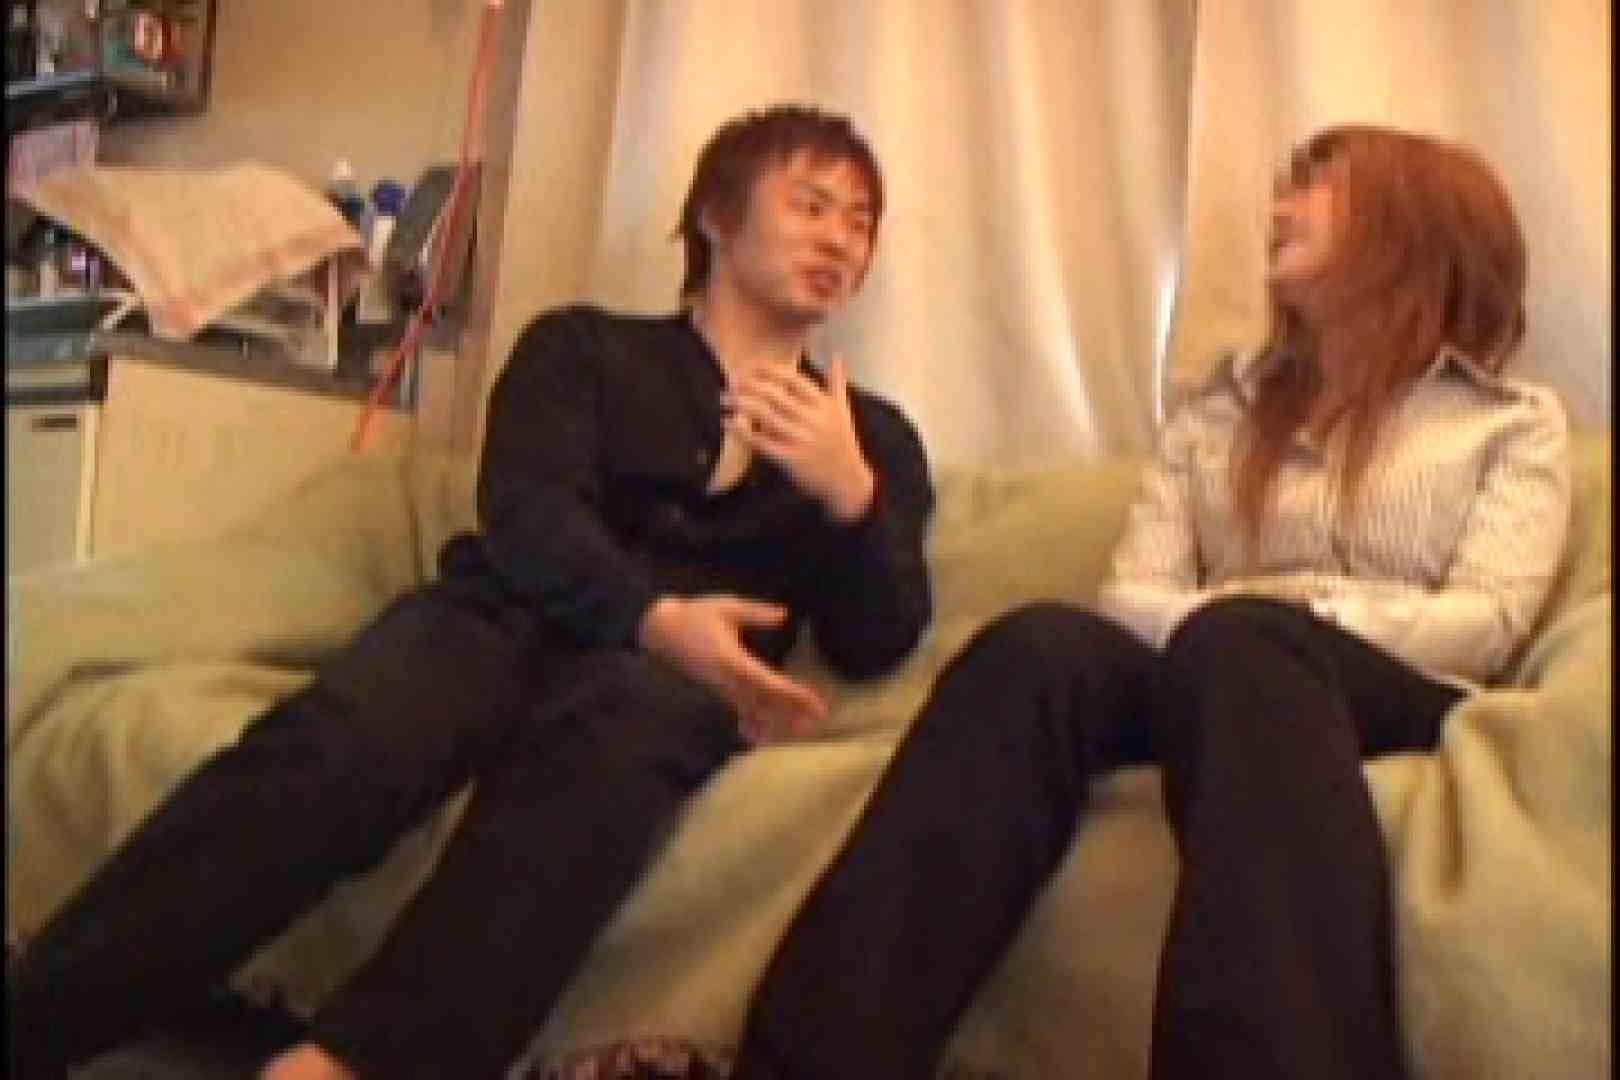 BEST OF イケメン!!男目線のガチSEX vol.03(対女性作品) 男同士 | イケメンのセックス  11枚 1